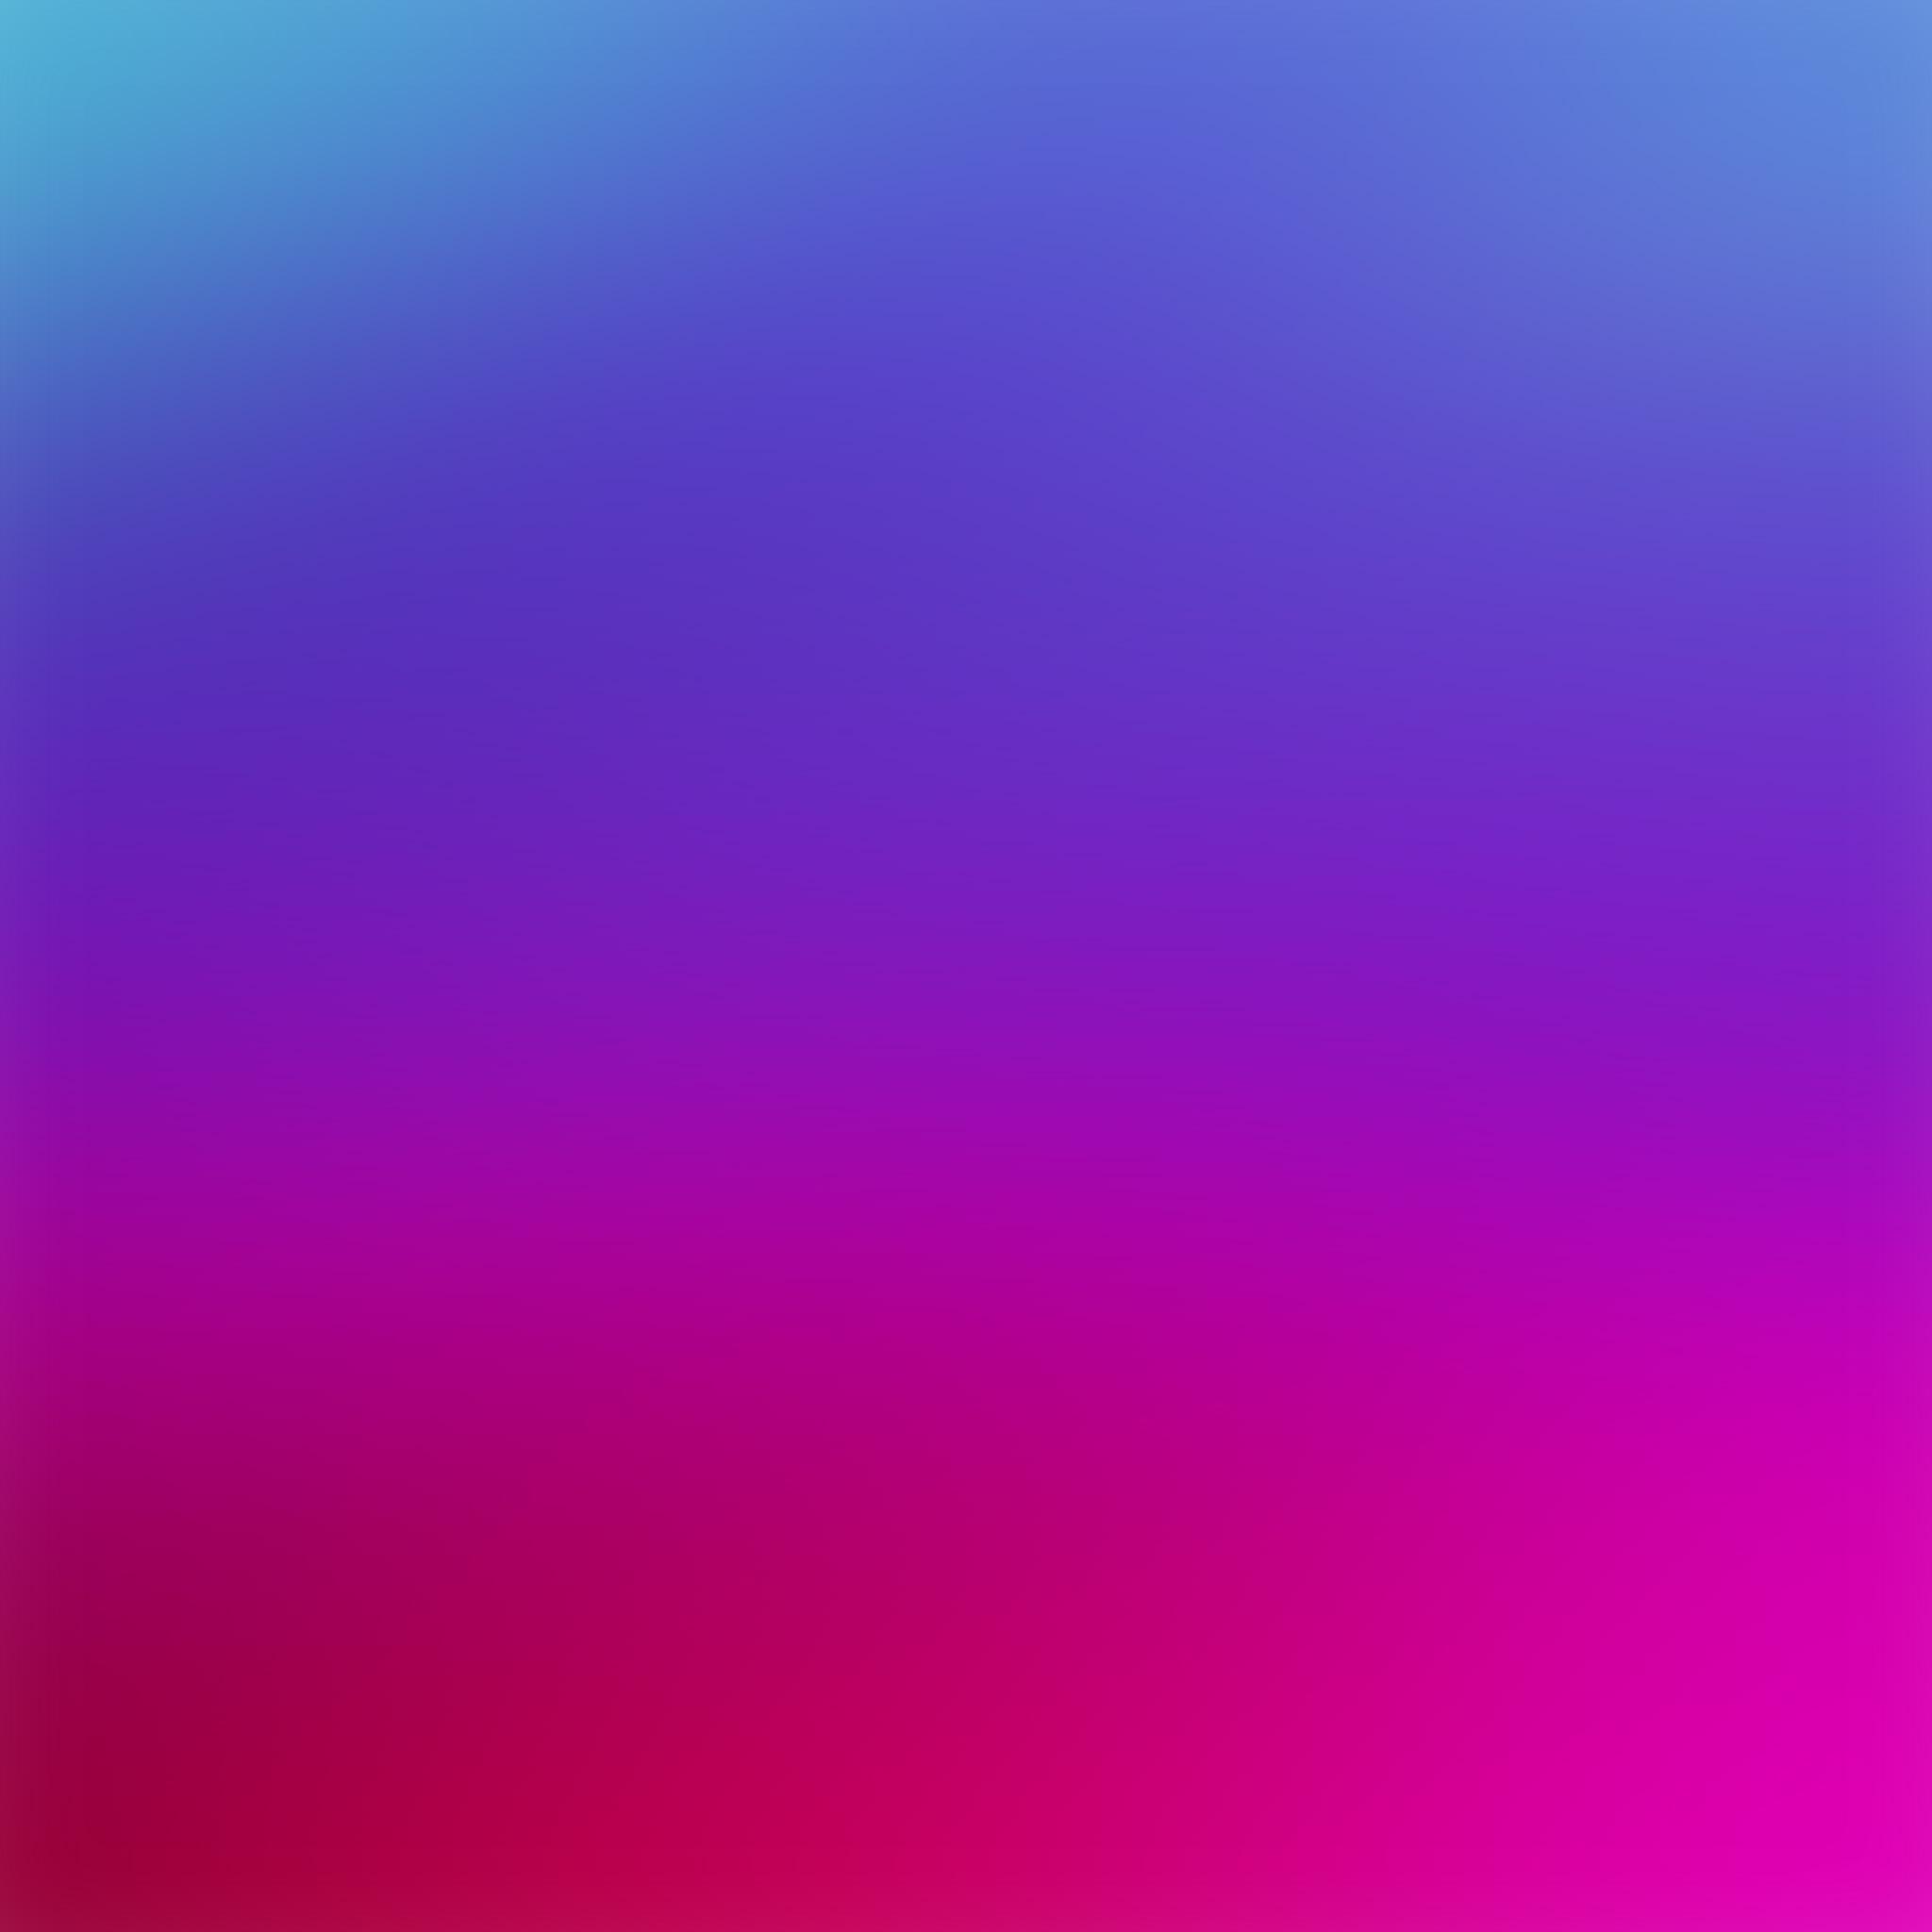 Sl30 Blue Pink Purple Blur Gradation Wallpaper